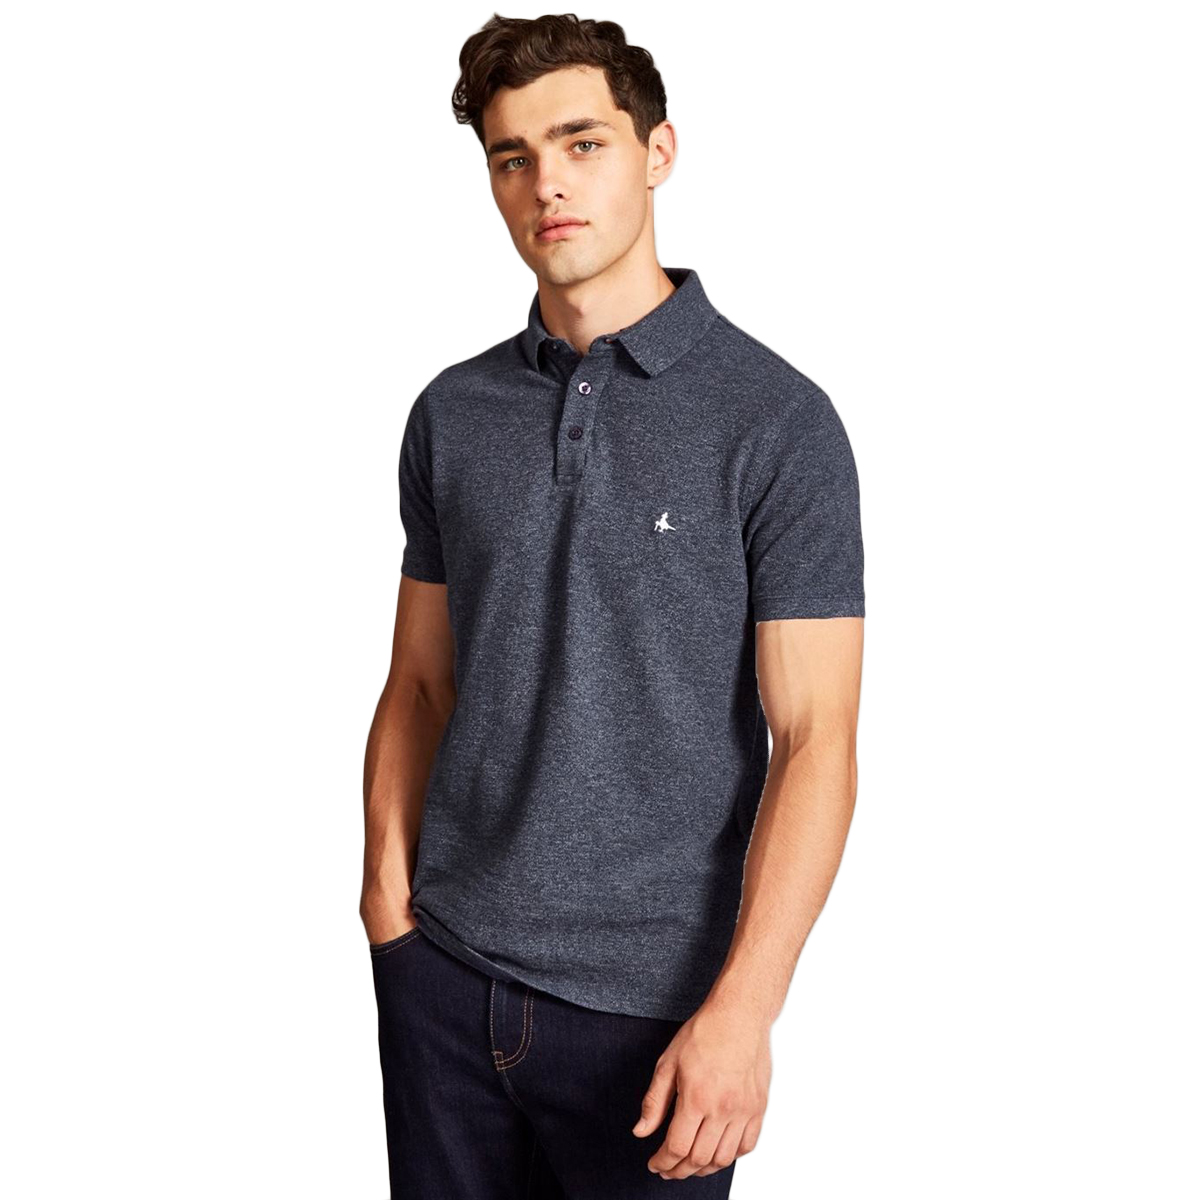 Jack Wills Men's Morley Jaspe Pique Short-Sleeve Polo - Black, XS